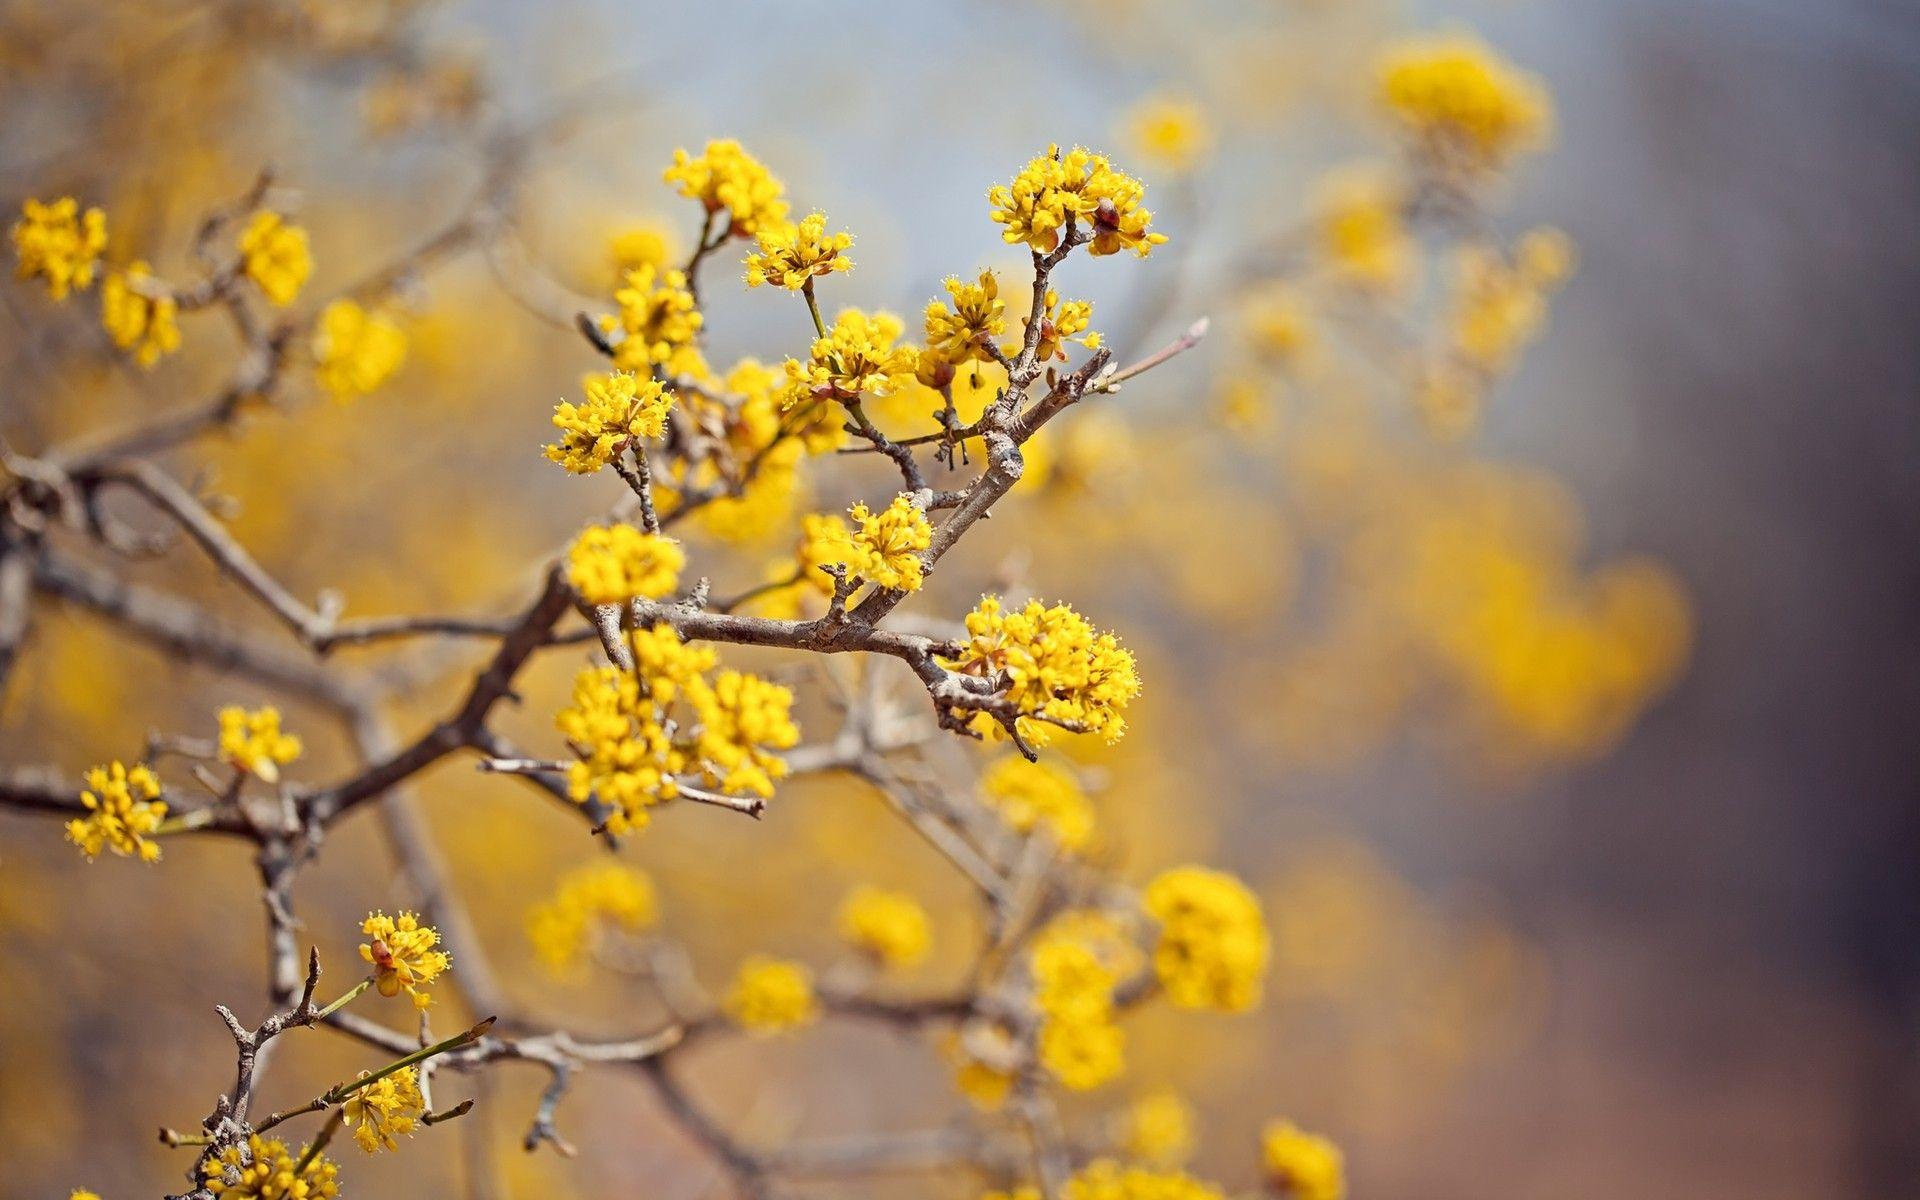 Yellow Flowers Wallpaper 46539 1920x1200 Px Yellow Flower Wallpaper Best Flower Wallpaper Yellow Blossom